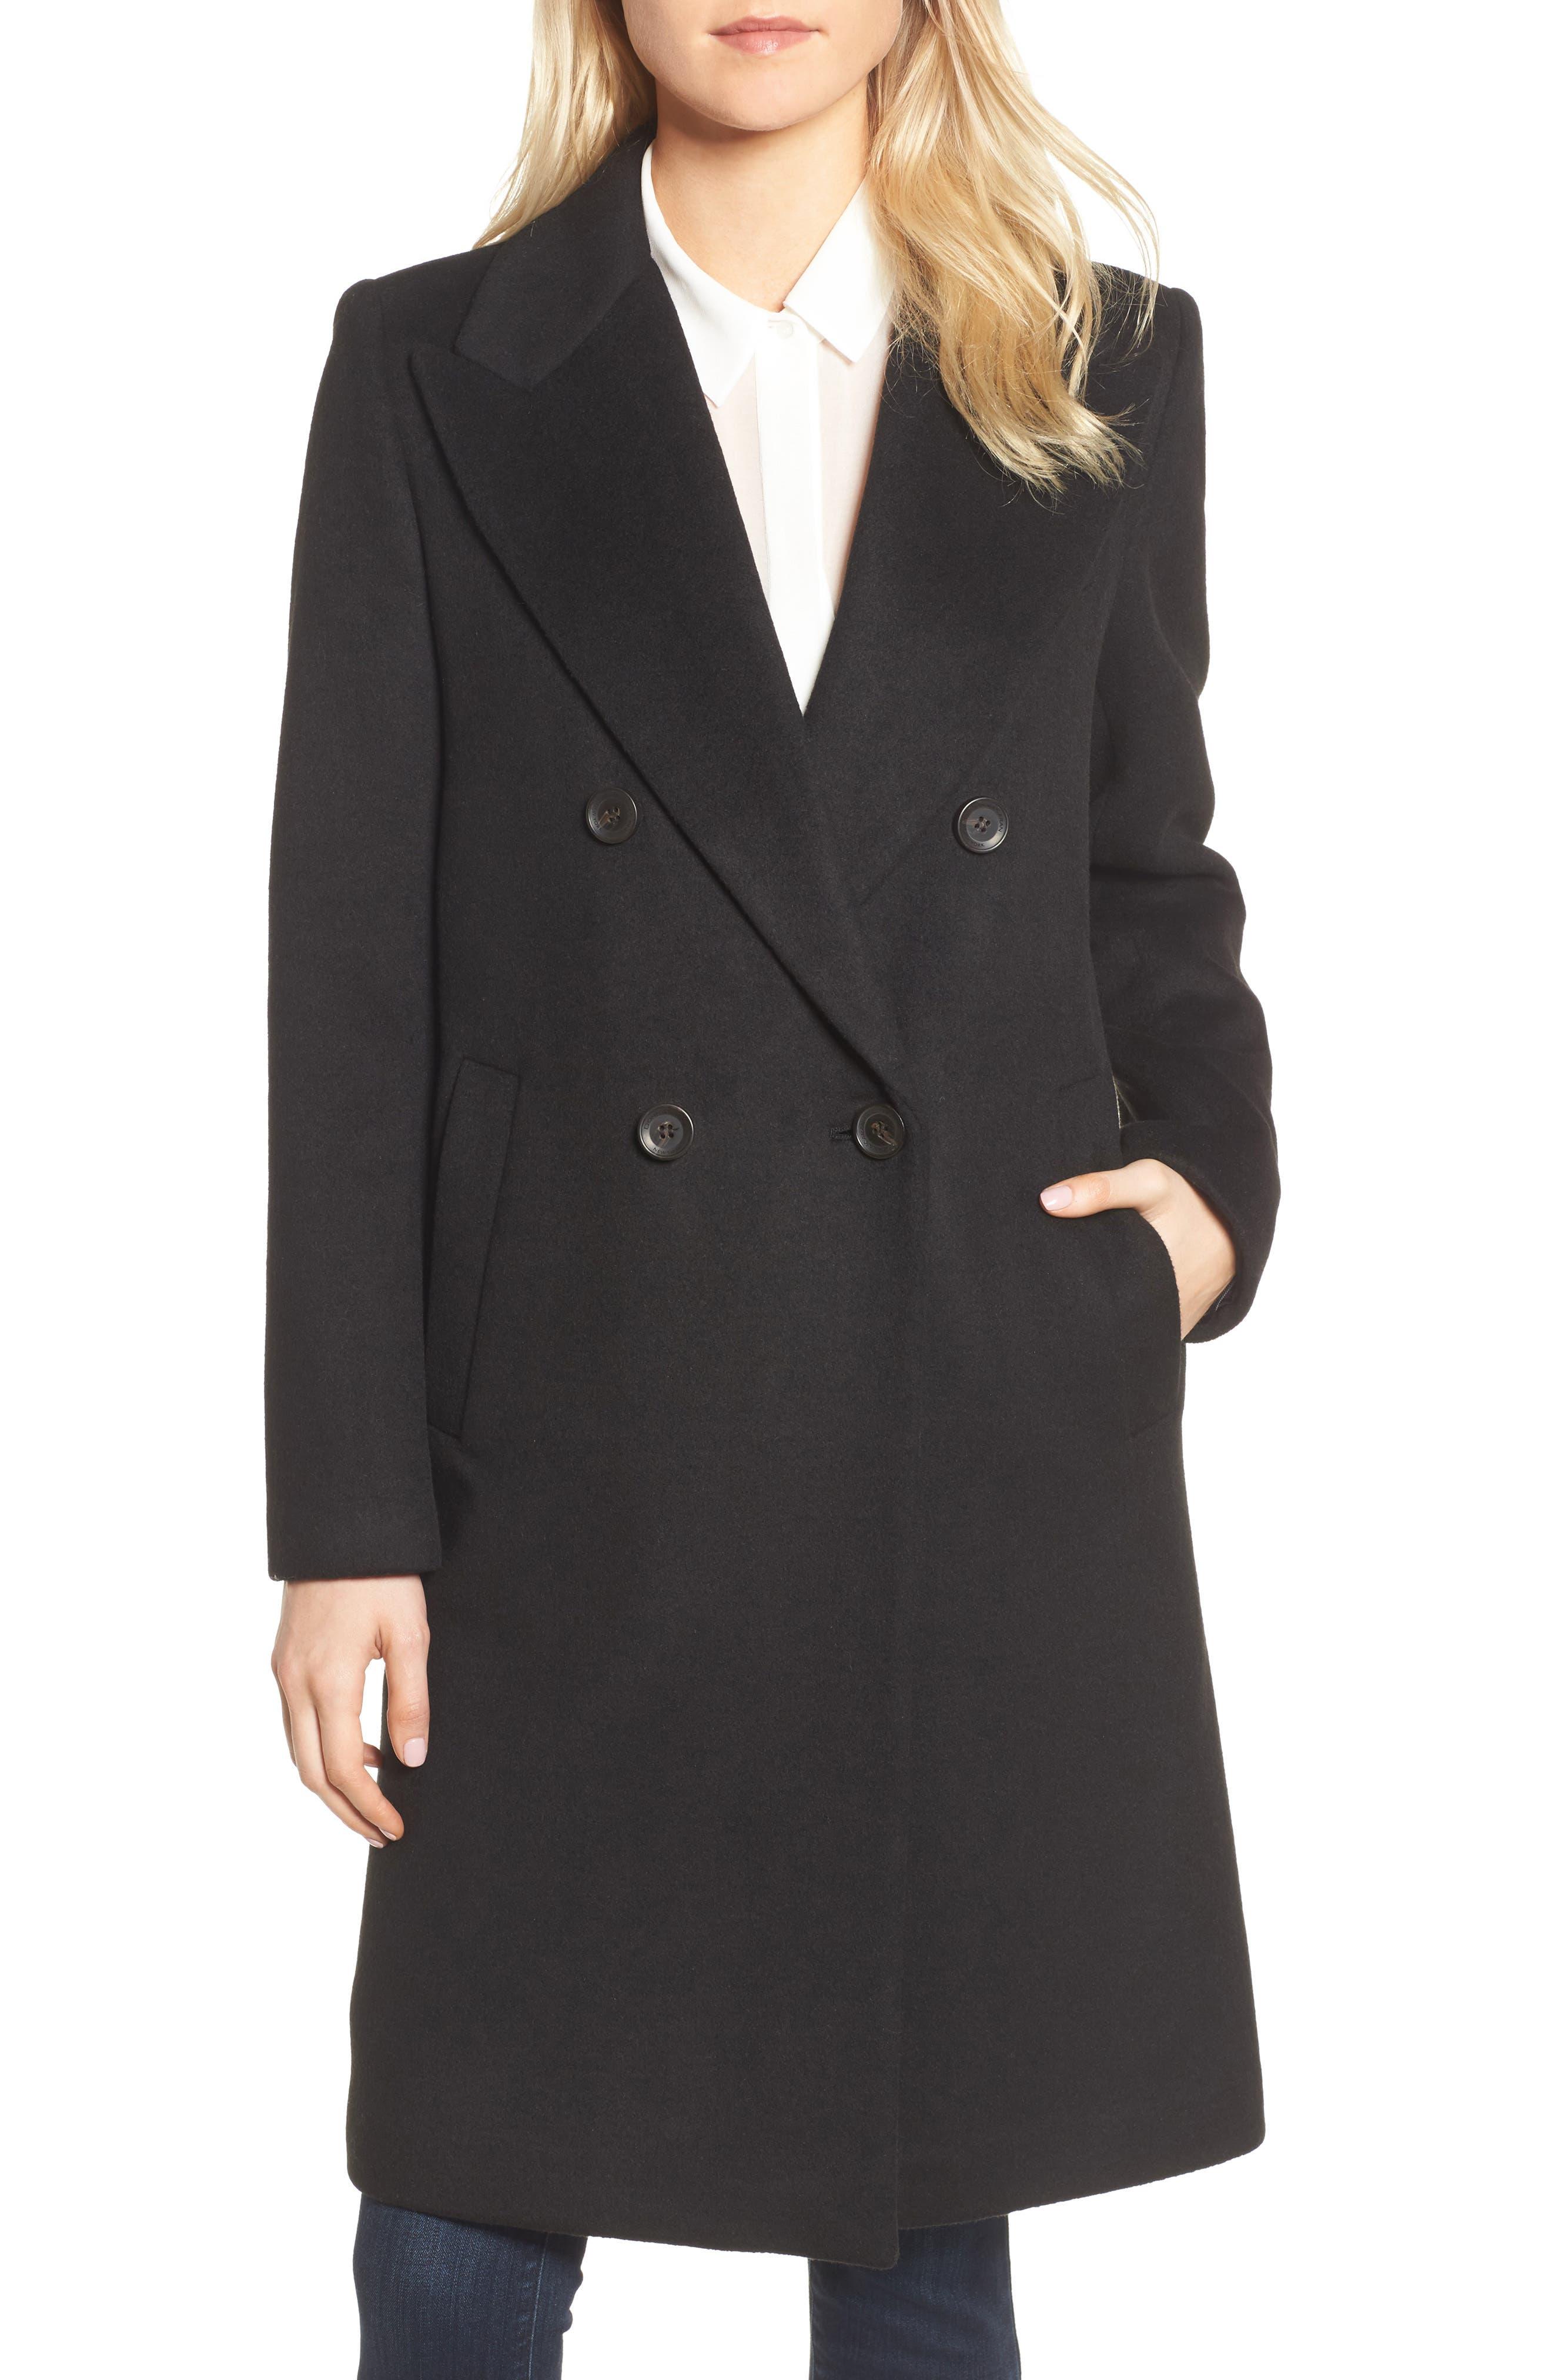 DKNY Lavish Wool Blend Coat,                         Main,                         color, Black